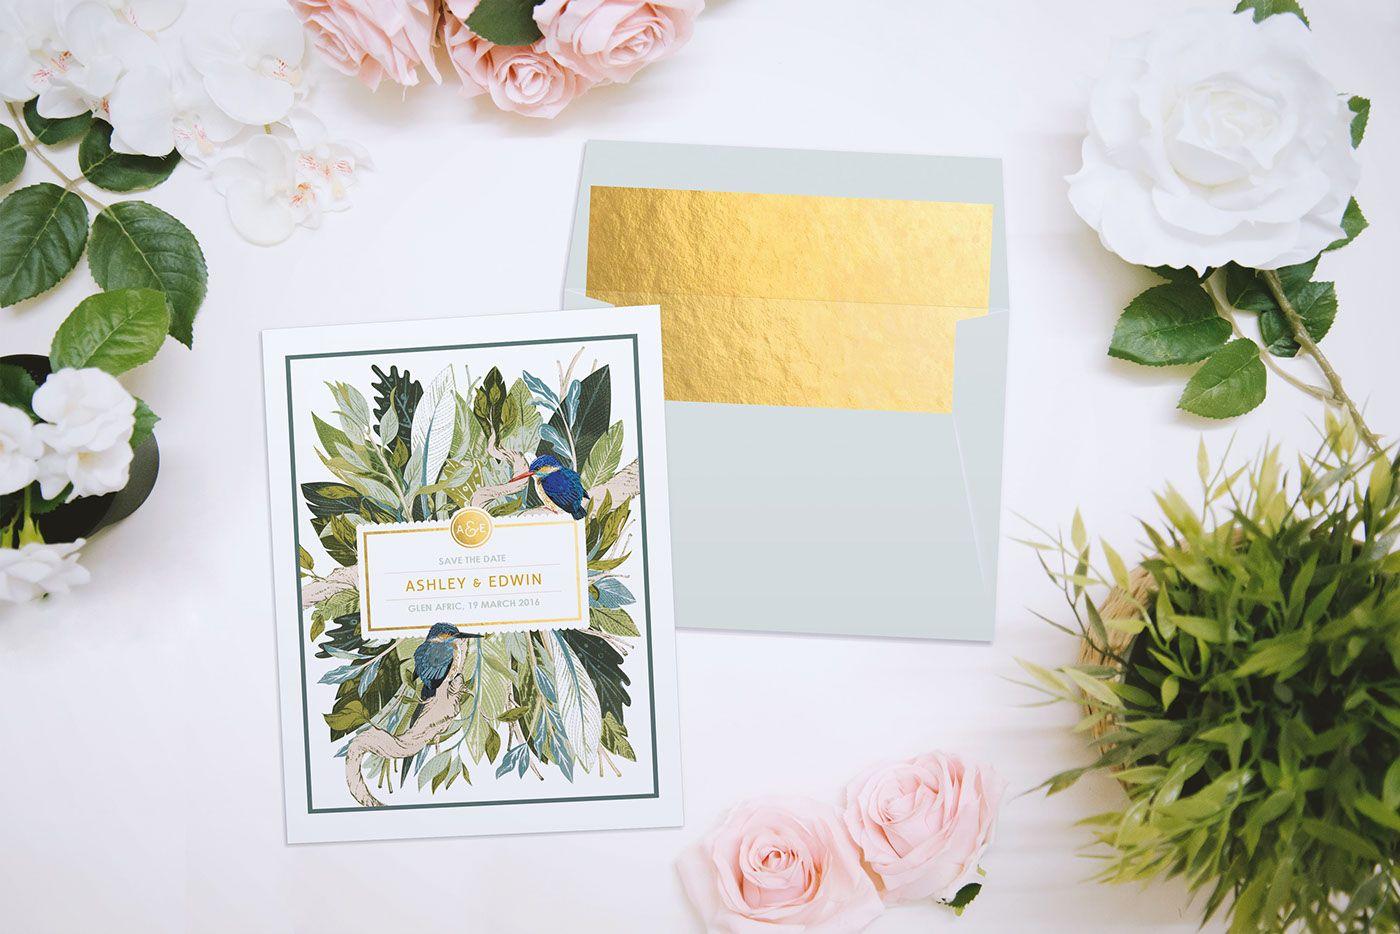 A showcase of 50 beautifully designed print invitations to inspire 4 print invitationsinvitation designinvitation paperyour designwedding stopboris Choice Image